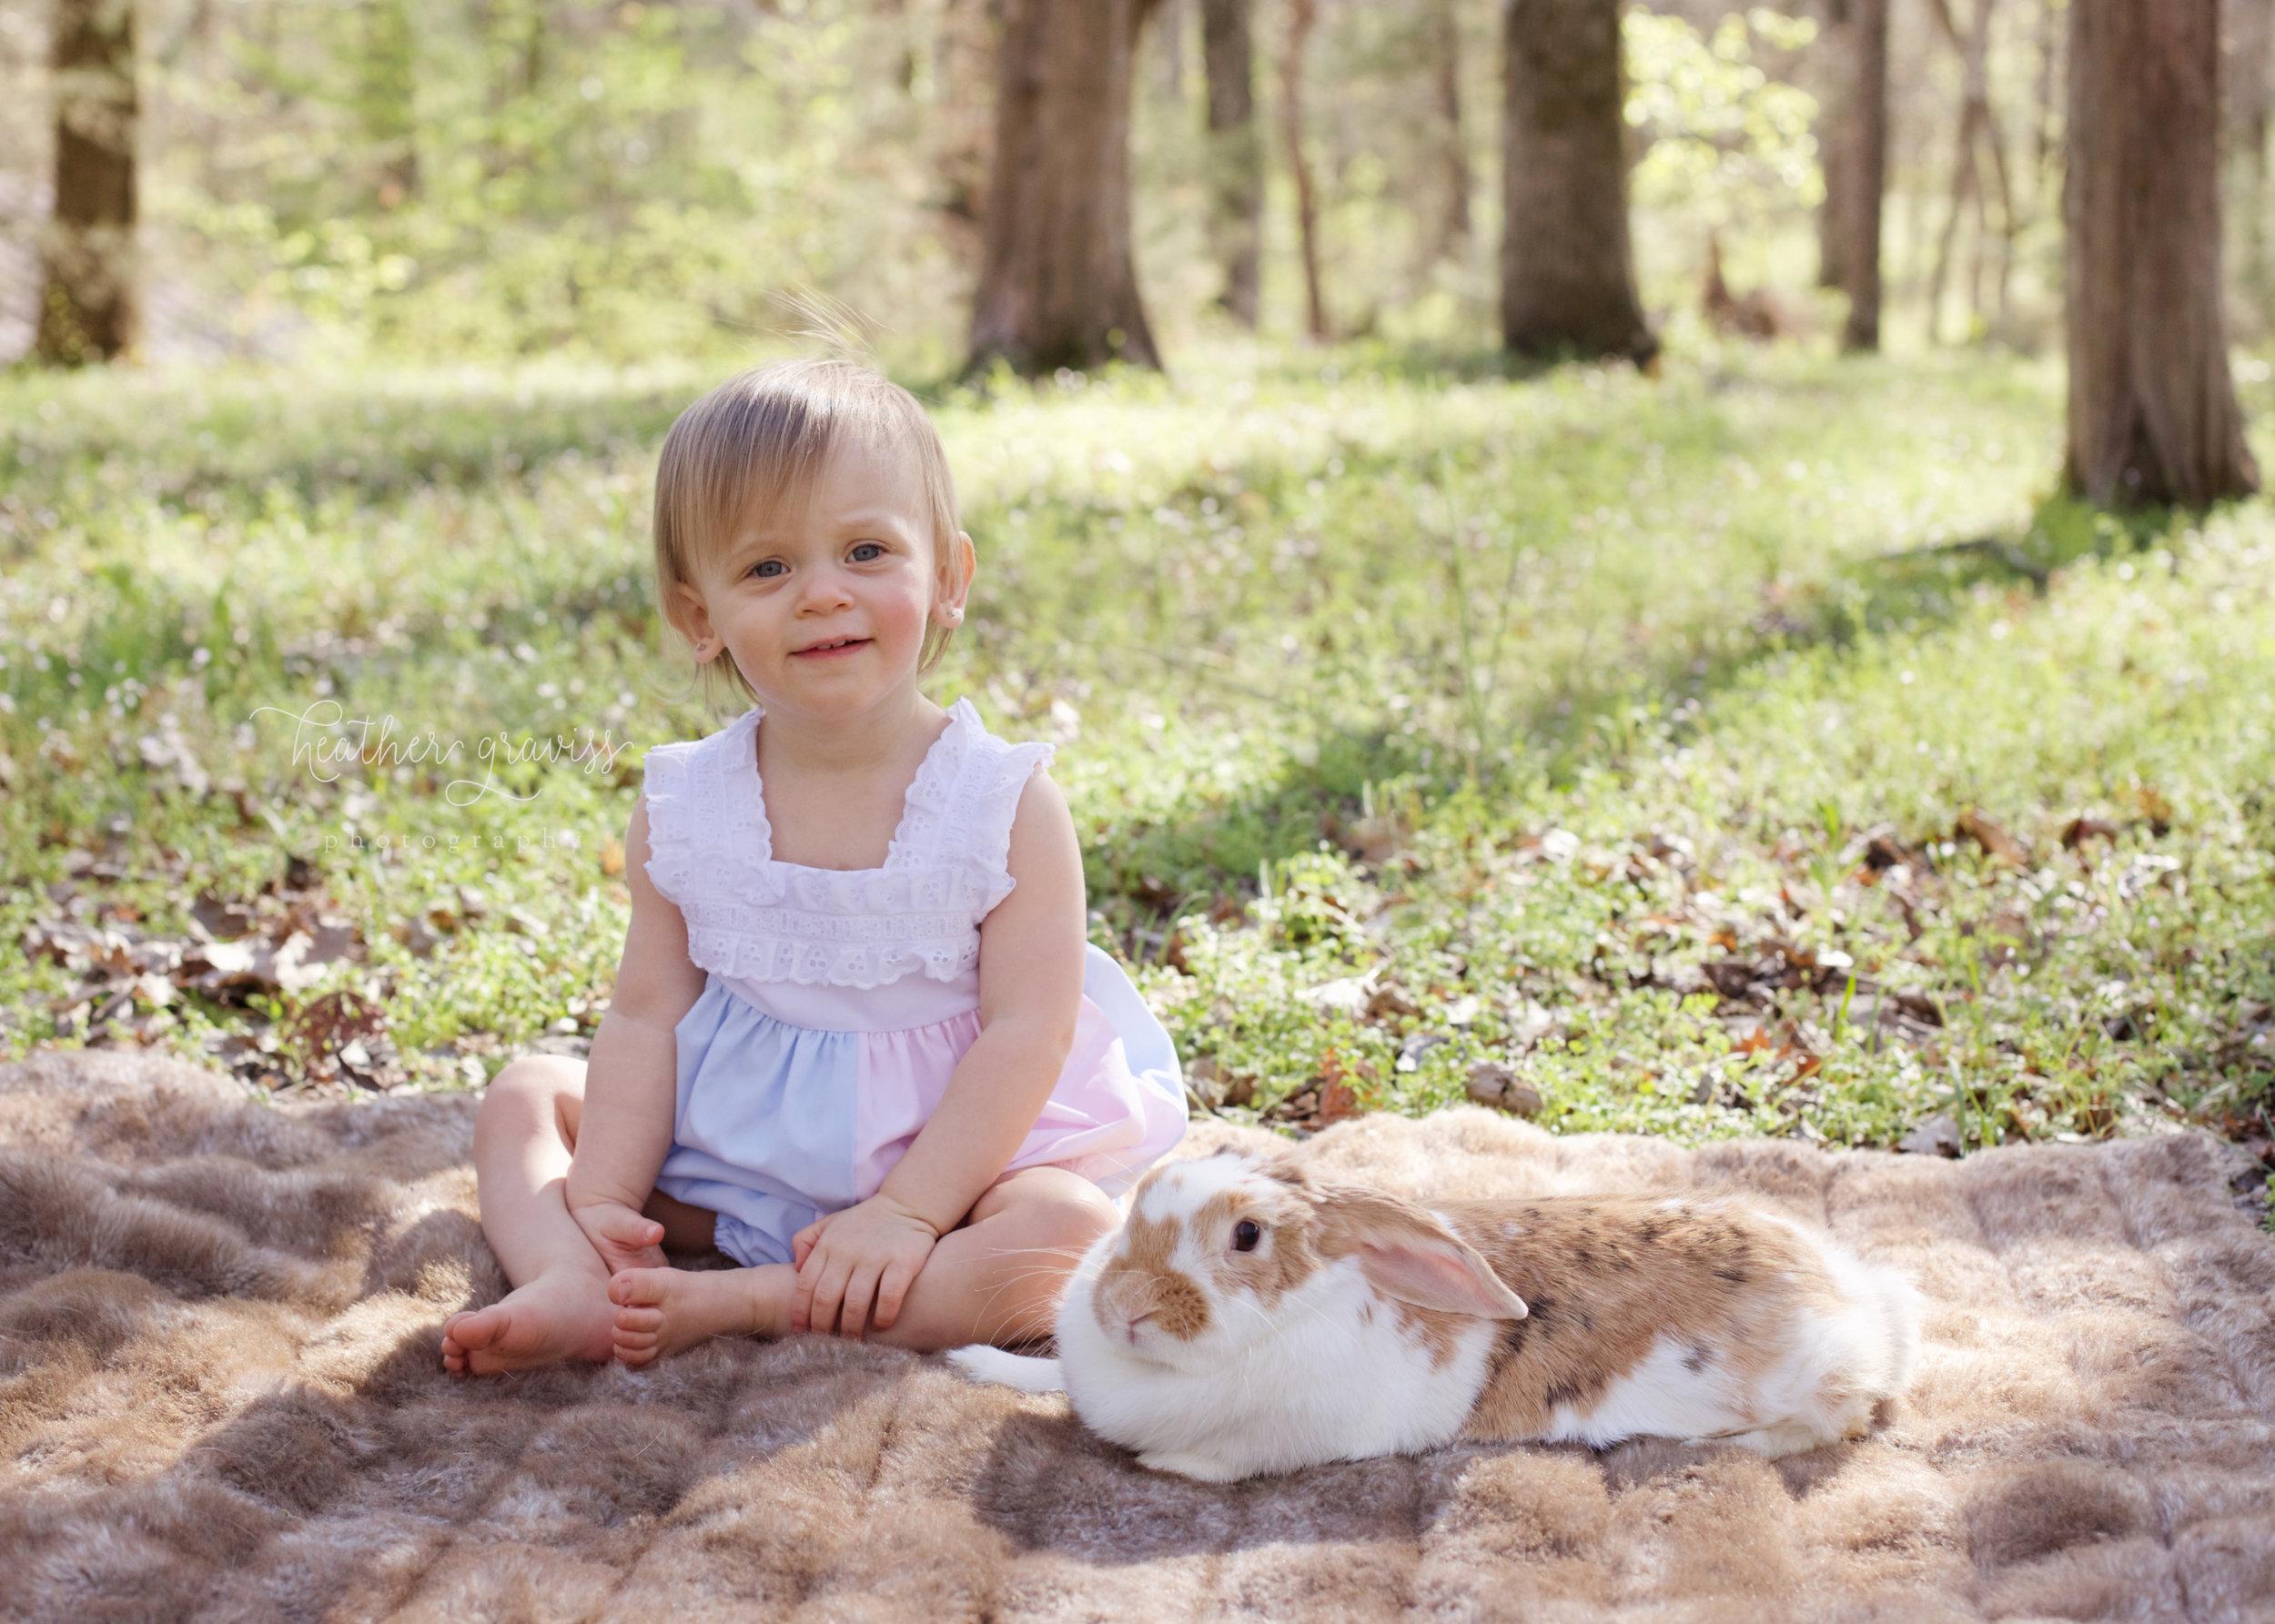 baby-girl-and-rabbit.jpg